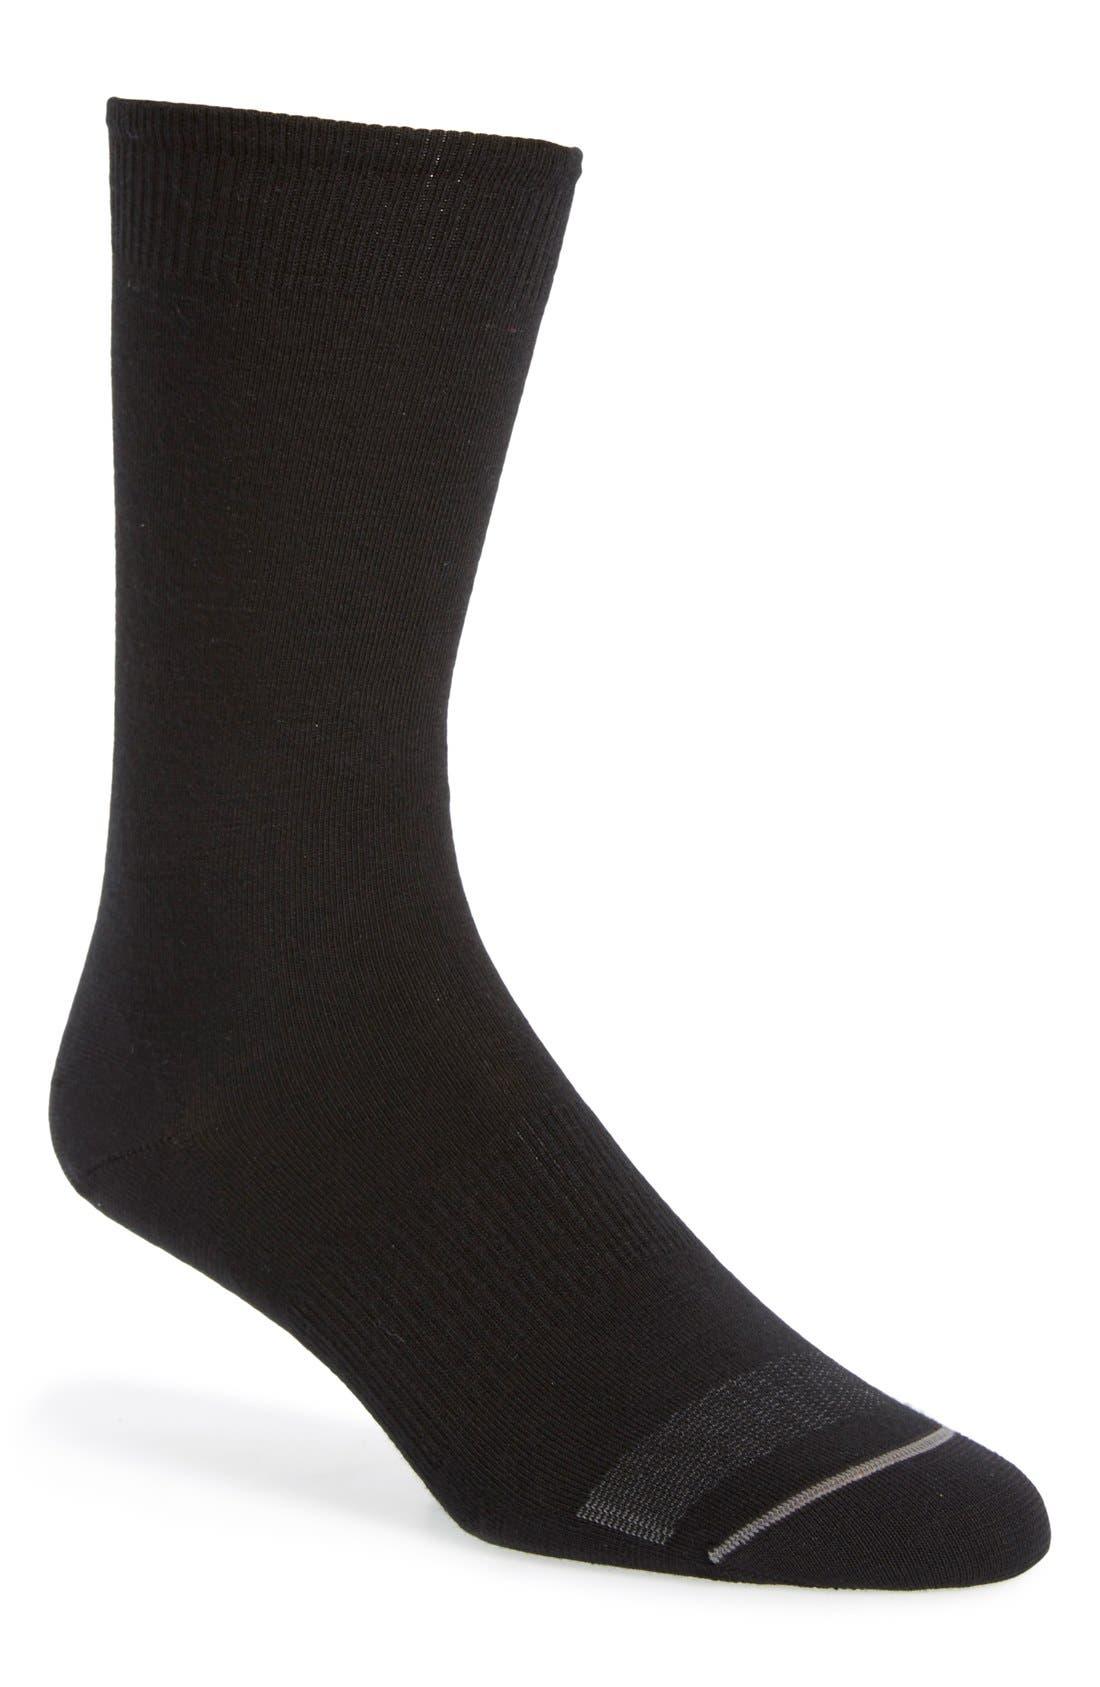 'Anchor Line' Merino Wool Blend Socks,                         Main,                         color, Black